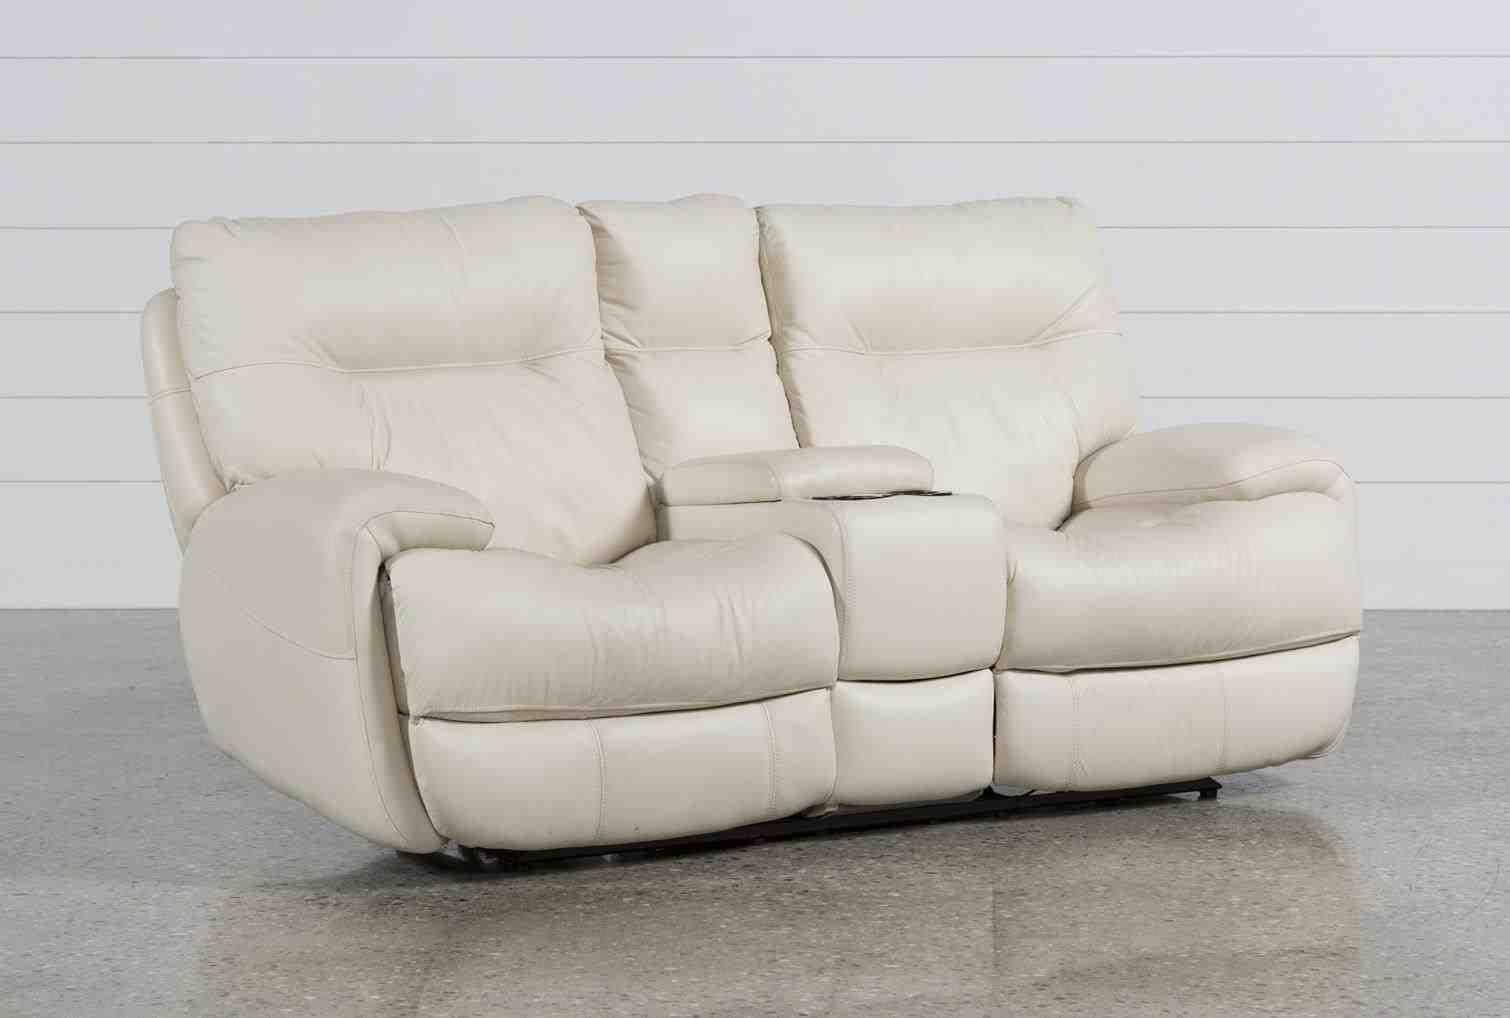 Cheap Loveseats Under 300 Full Size Of Furniture Loveseats Under